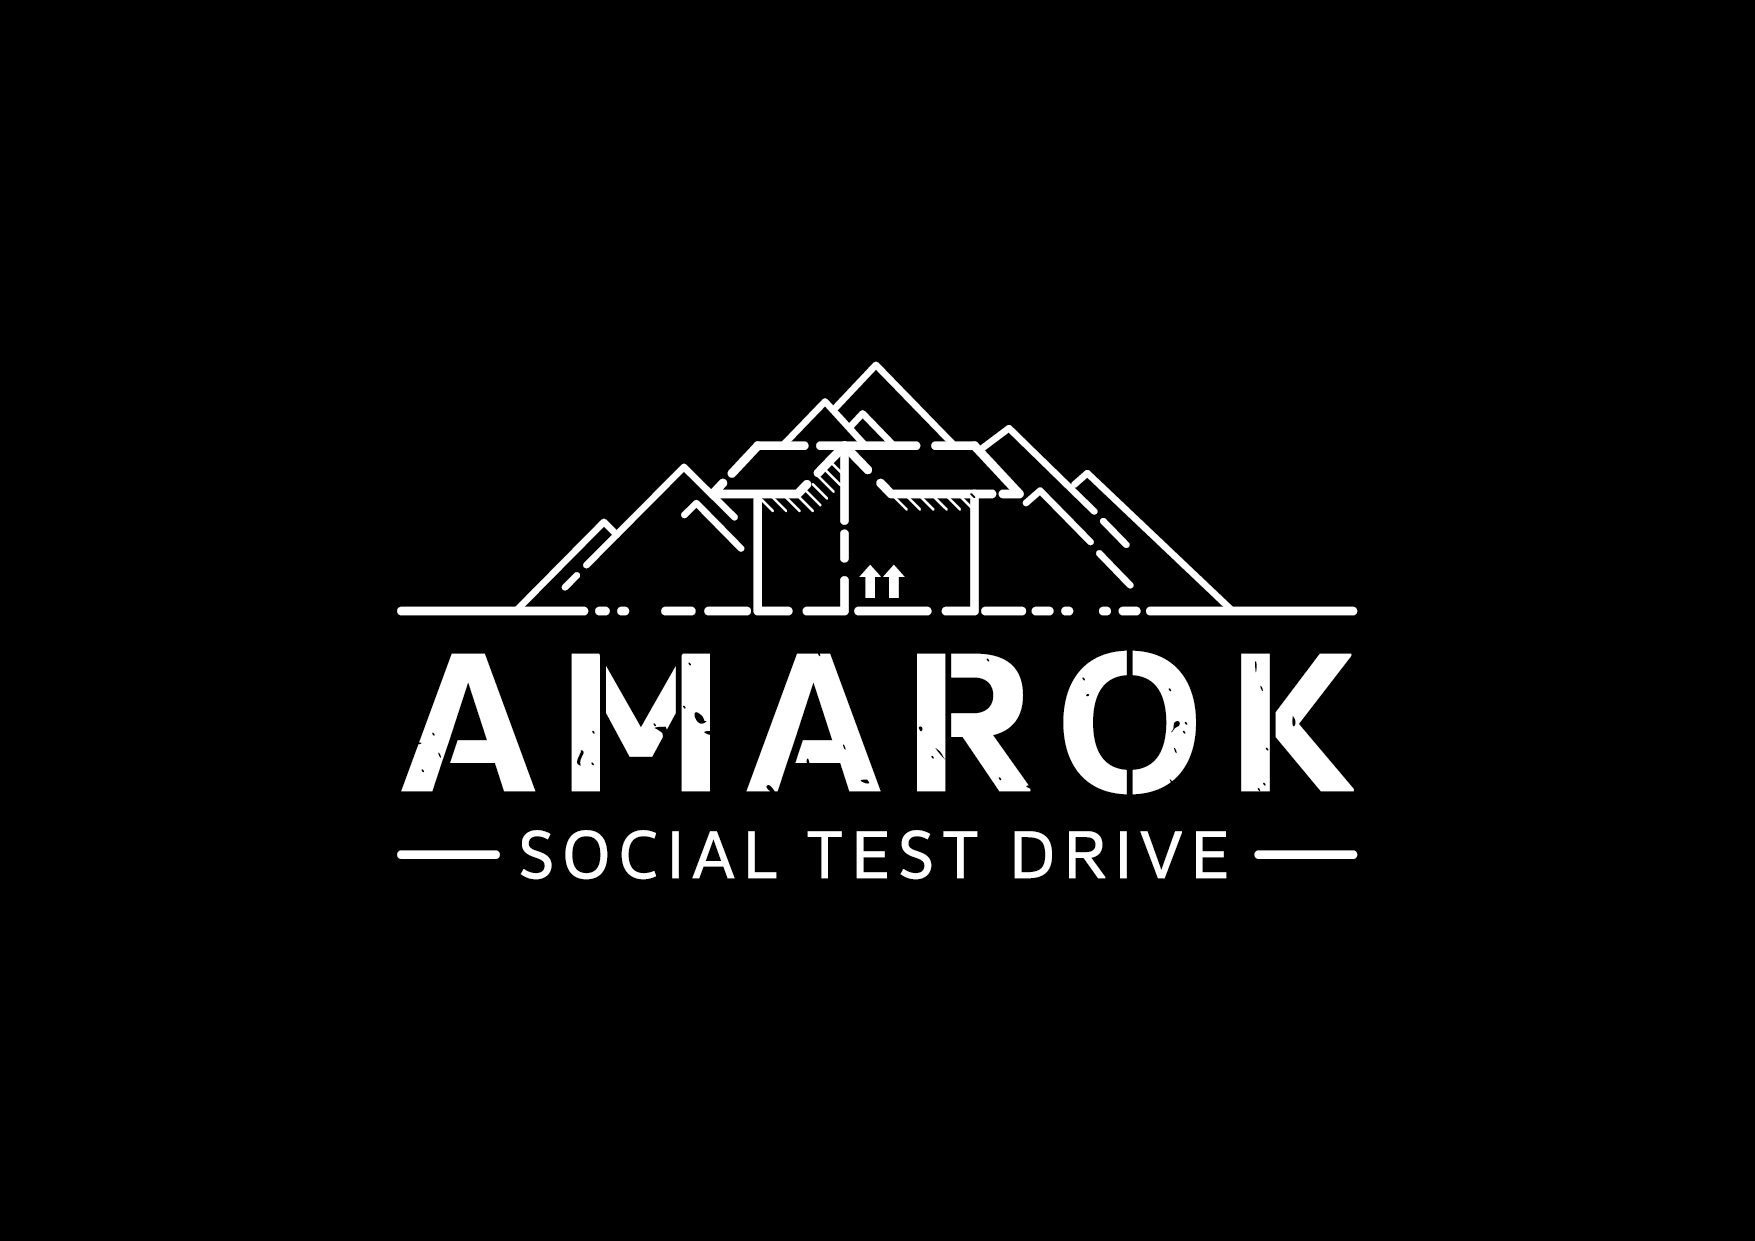 AMAROK_STD_LOGO-02.jpg